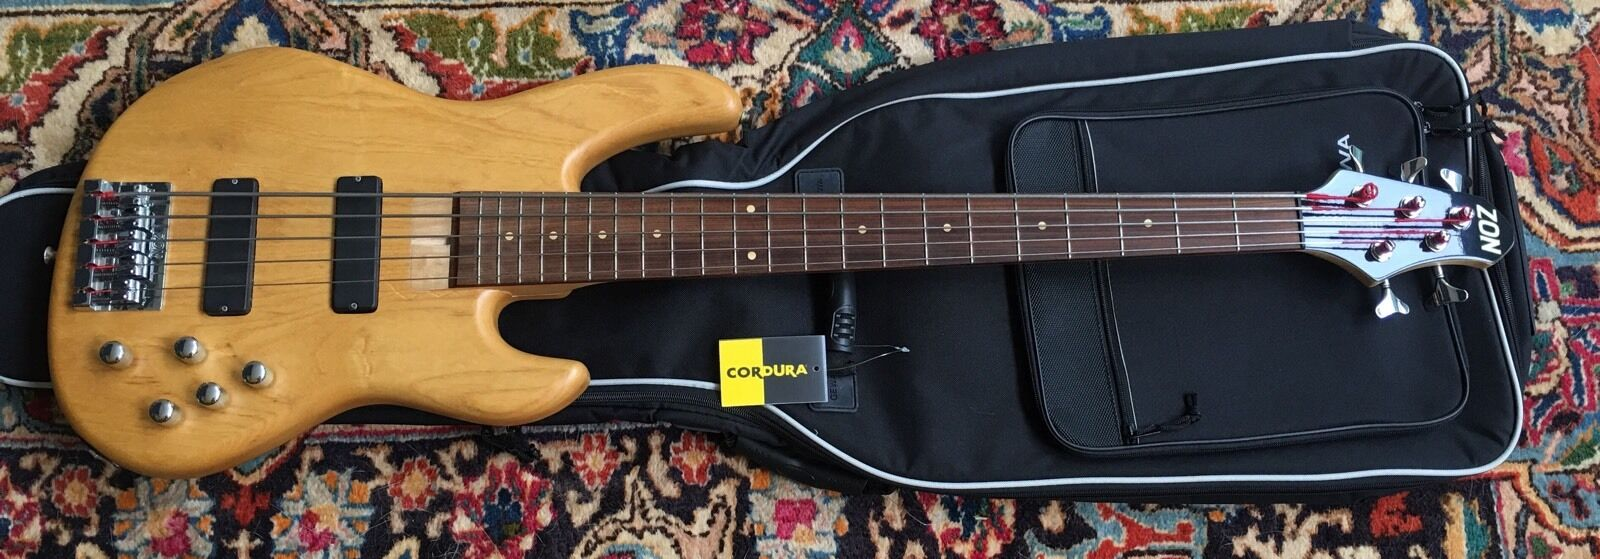 Zon Mosaic Pro 5 String Bass